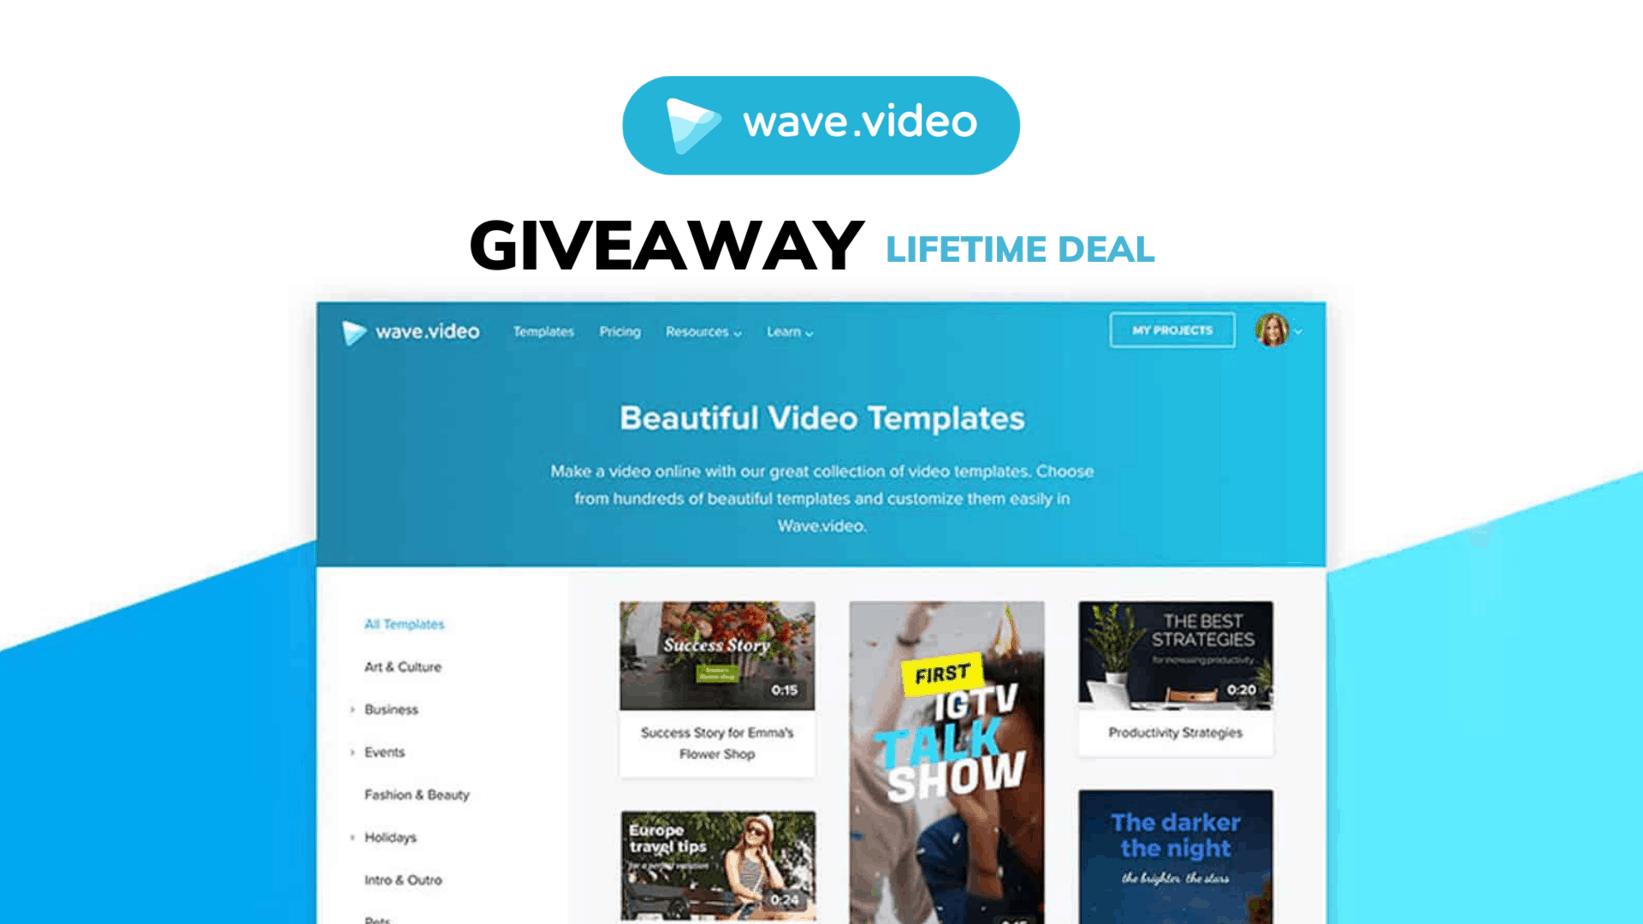 wave video giveaway